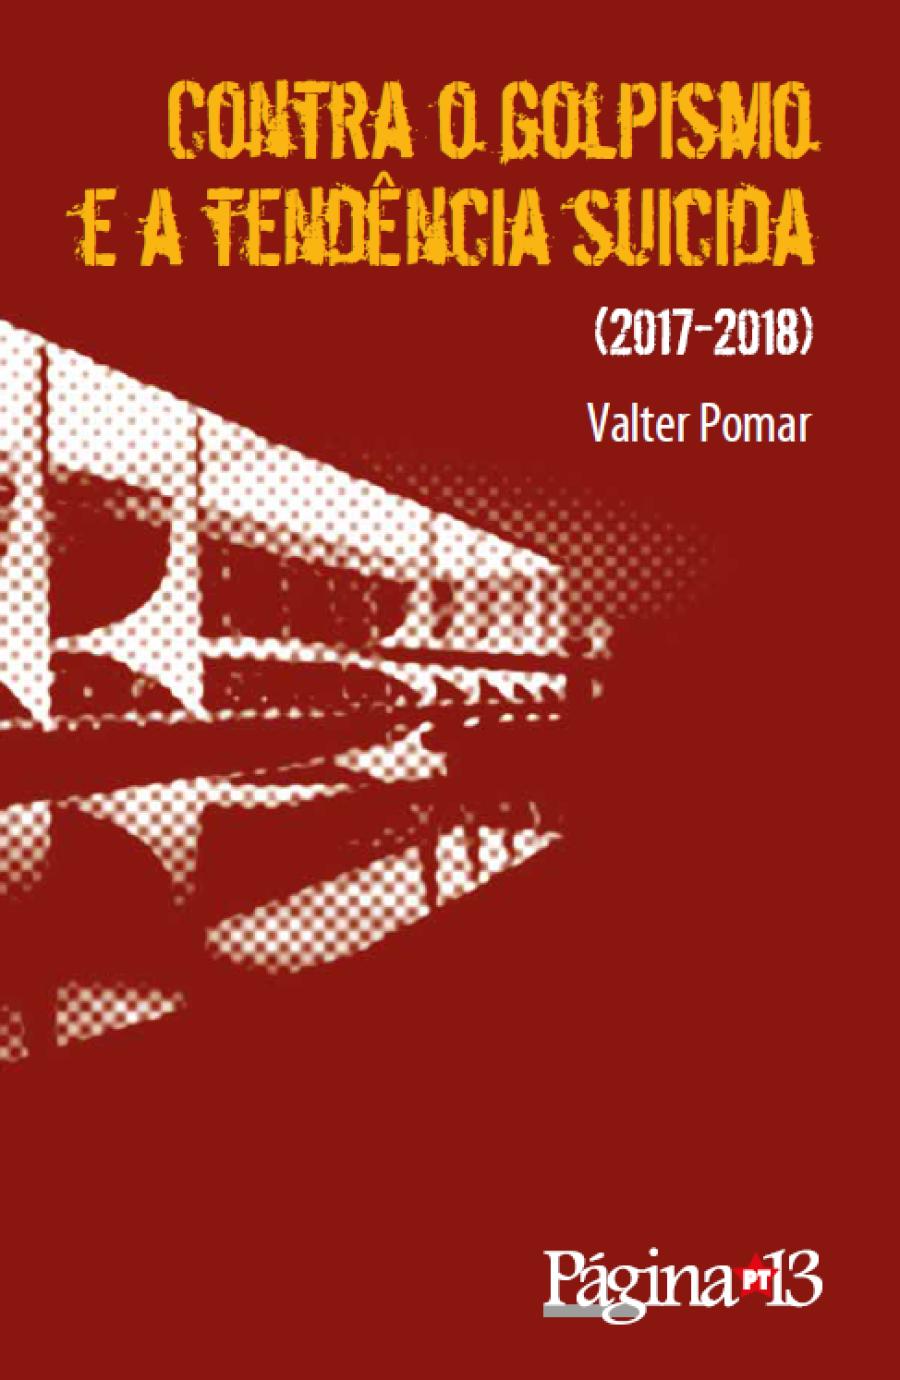 Contra o golpismo 2017-2018 por Valter Pomar